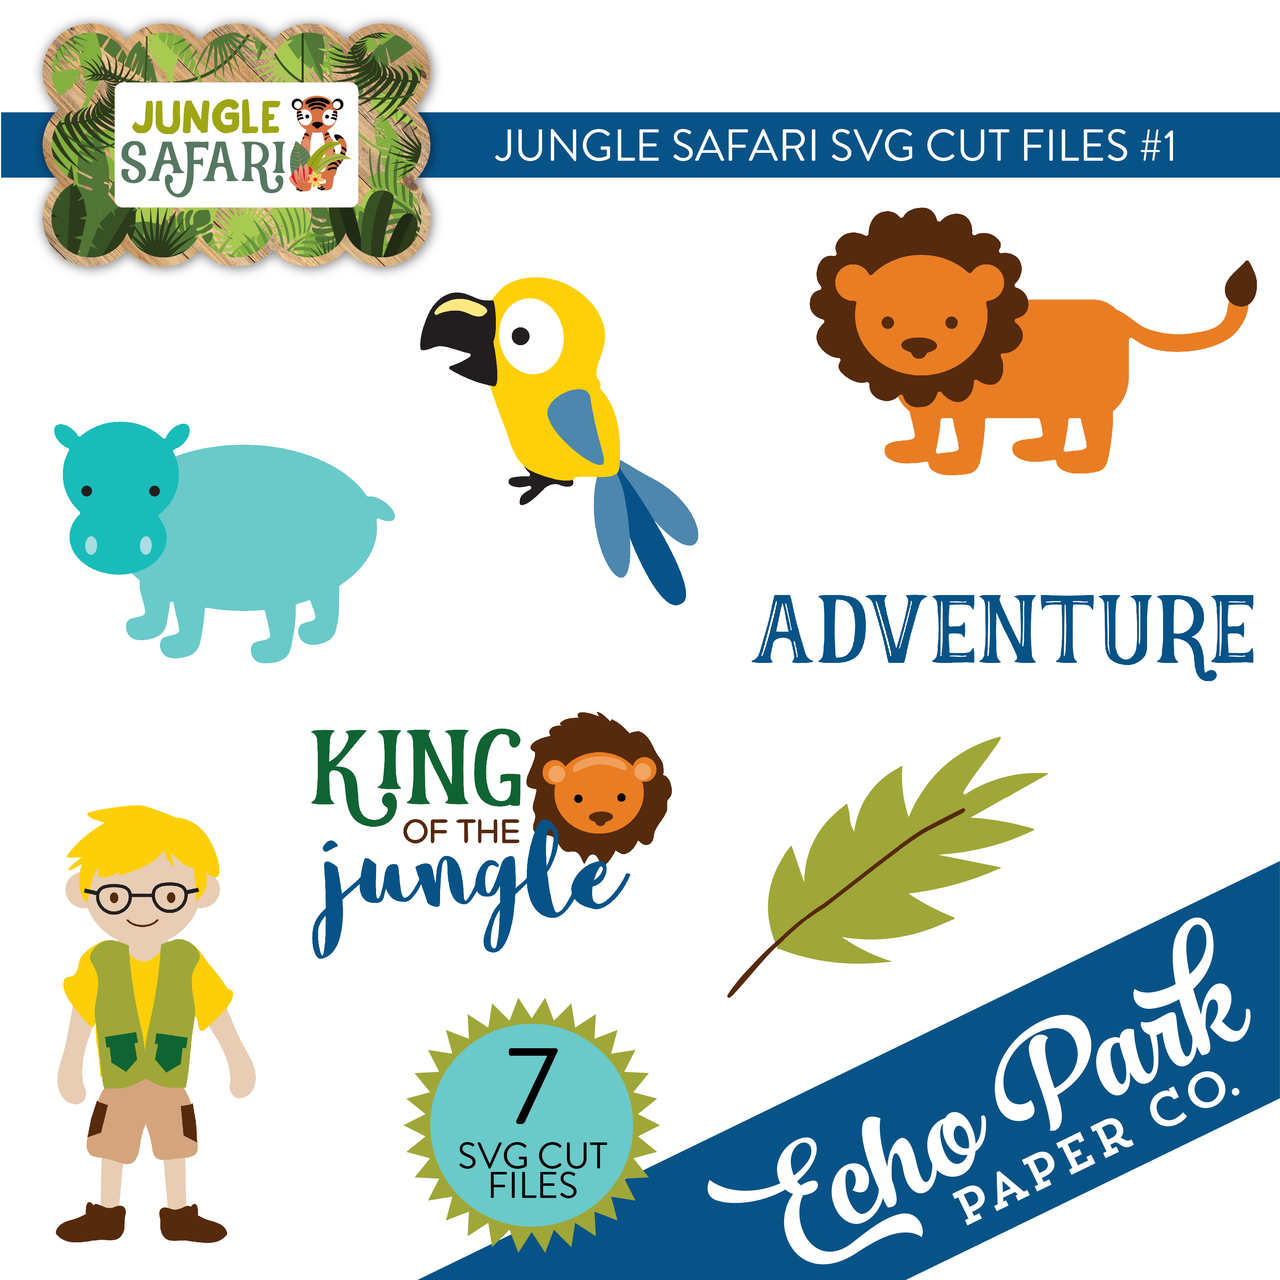 Jungle Safari SVG Cut Files #1